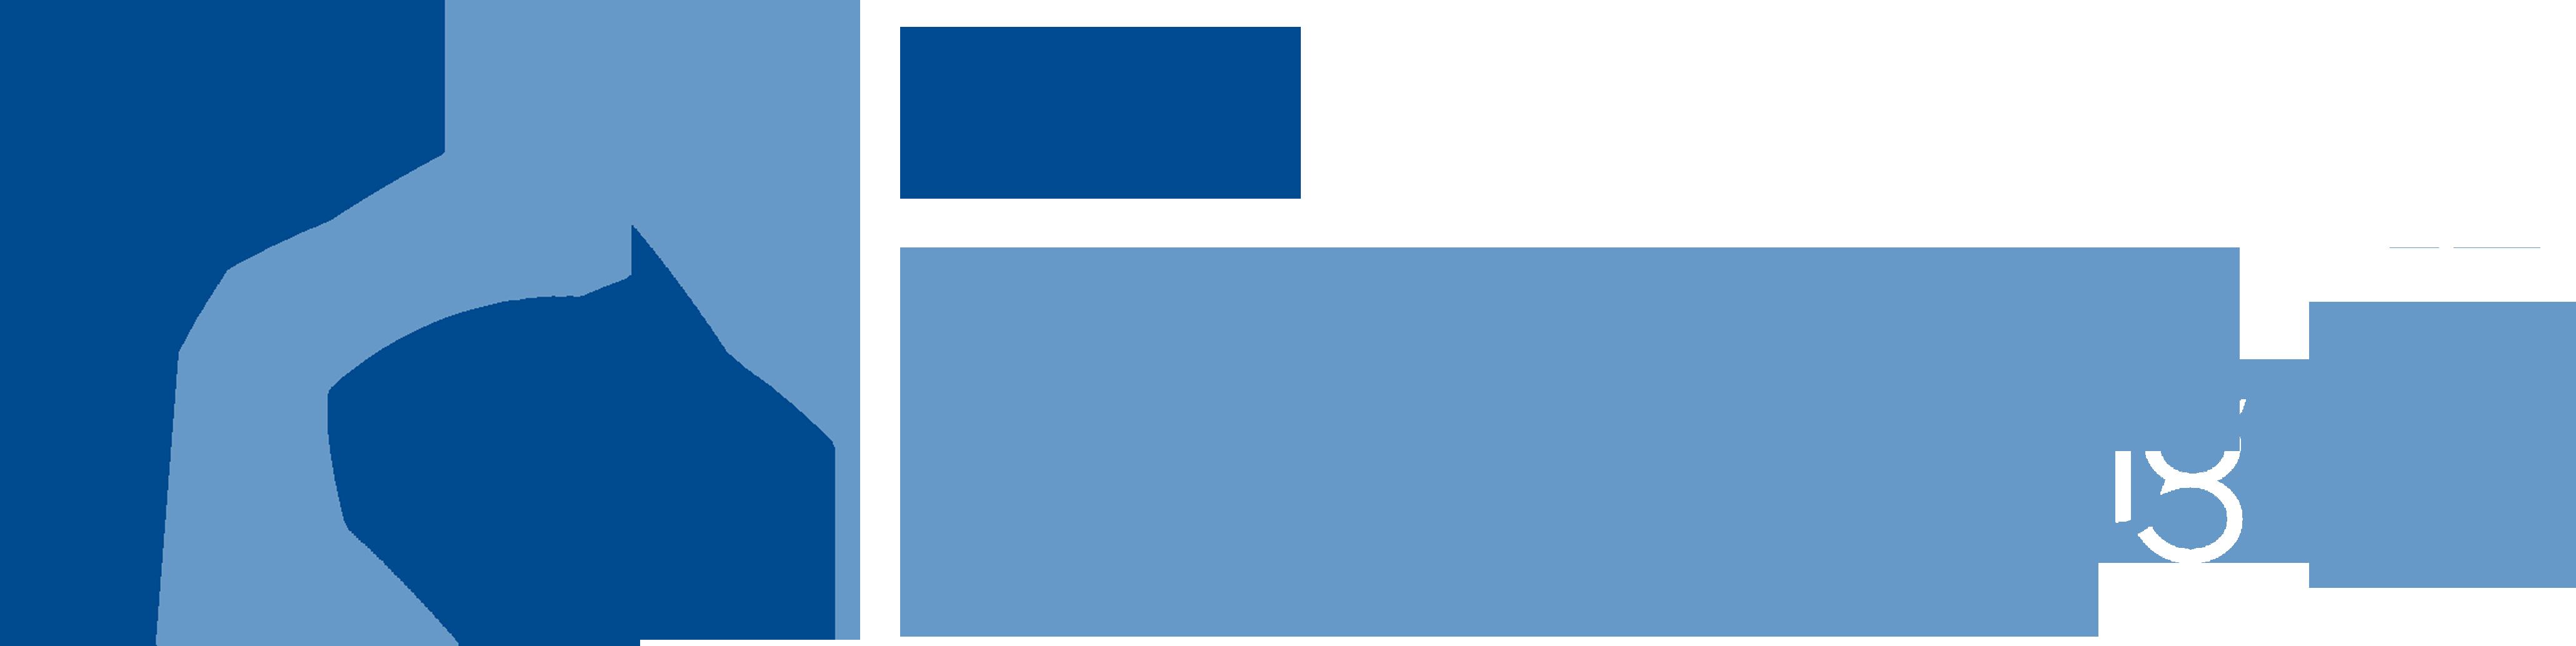 bb-bewindvoering Logo Full Width 400ppi